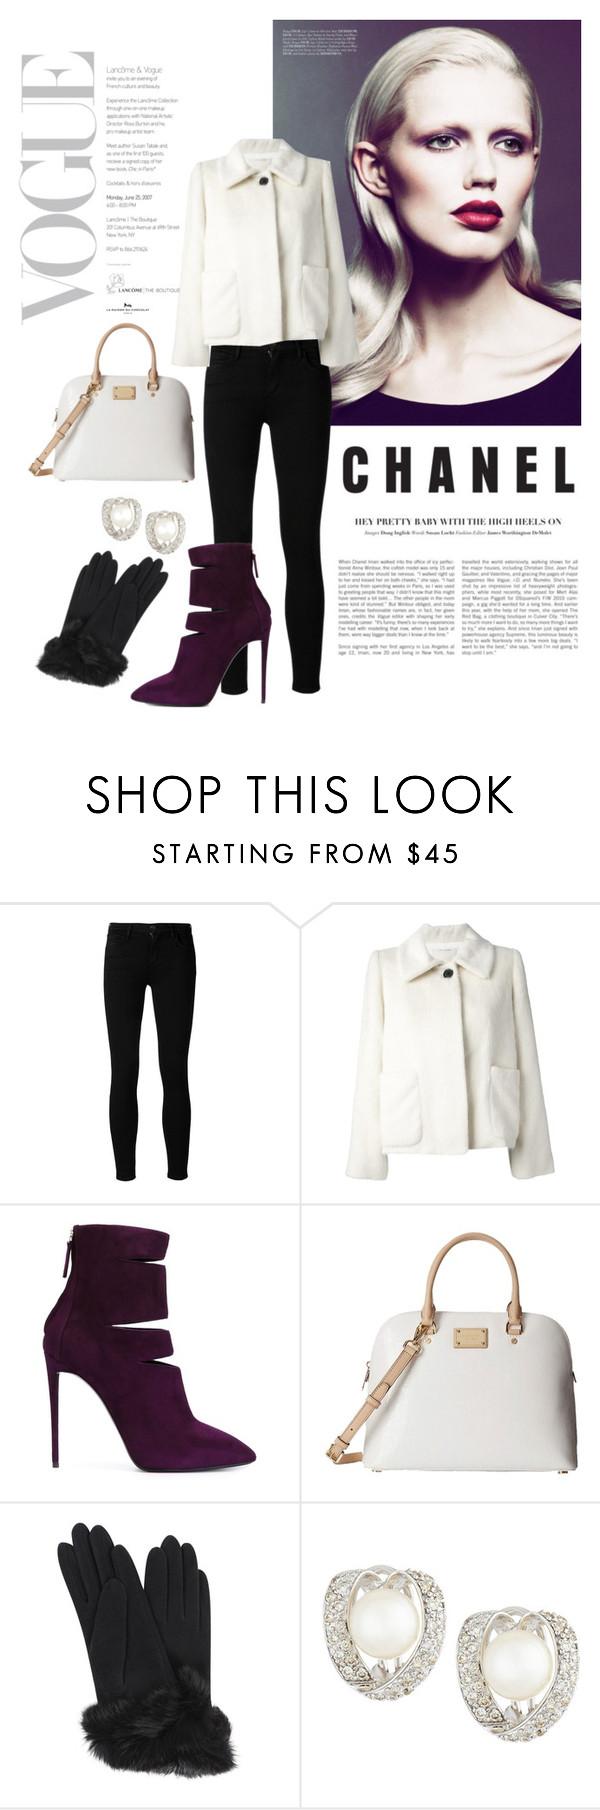 """#H"" by deame ❤ liked on Polyvore featuring moda, Goldsign, Marc Jacobs, Giuseppe Zanotti, Michael Kors, Carolina Amato, Belpearl, women's clothing, women's fashion e women"